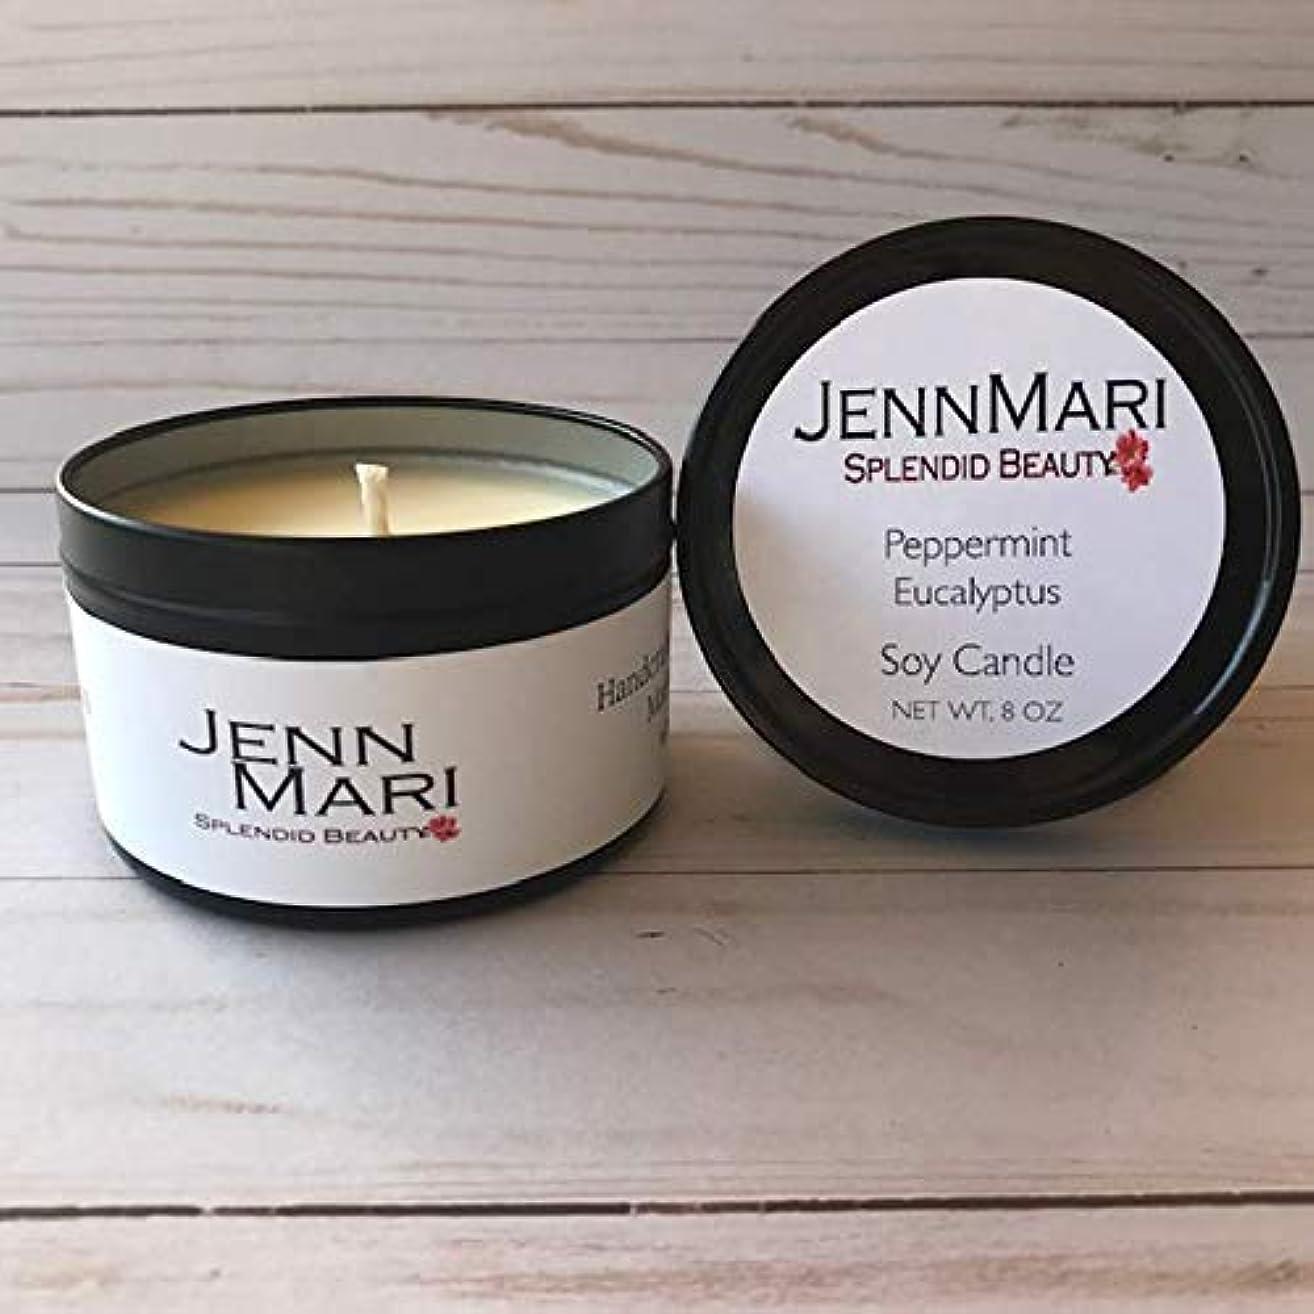 Splendid Beauty   Peppermint & Eucalyptus Scented Soy Candle 8 Oz Tin   Handmade   Eco-friendly   Vegan   Cotton Wick   100% Soy Wax